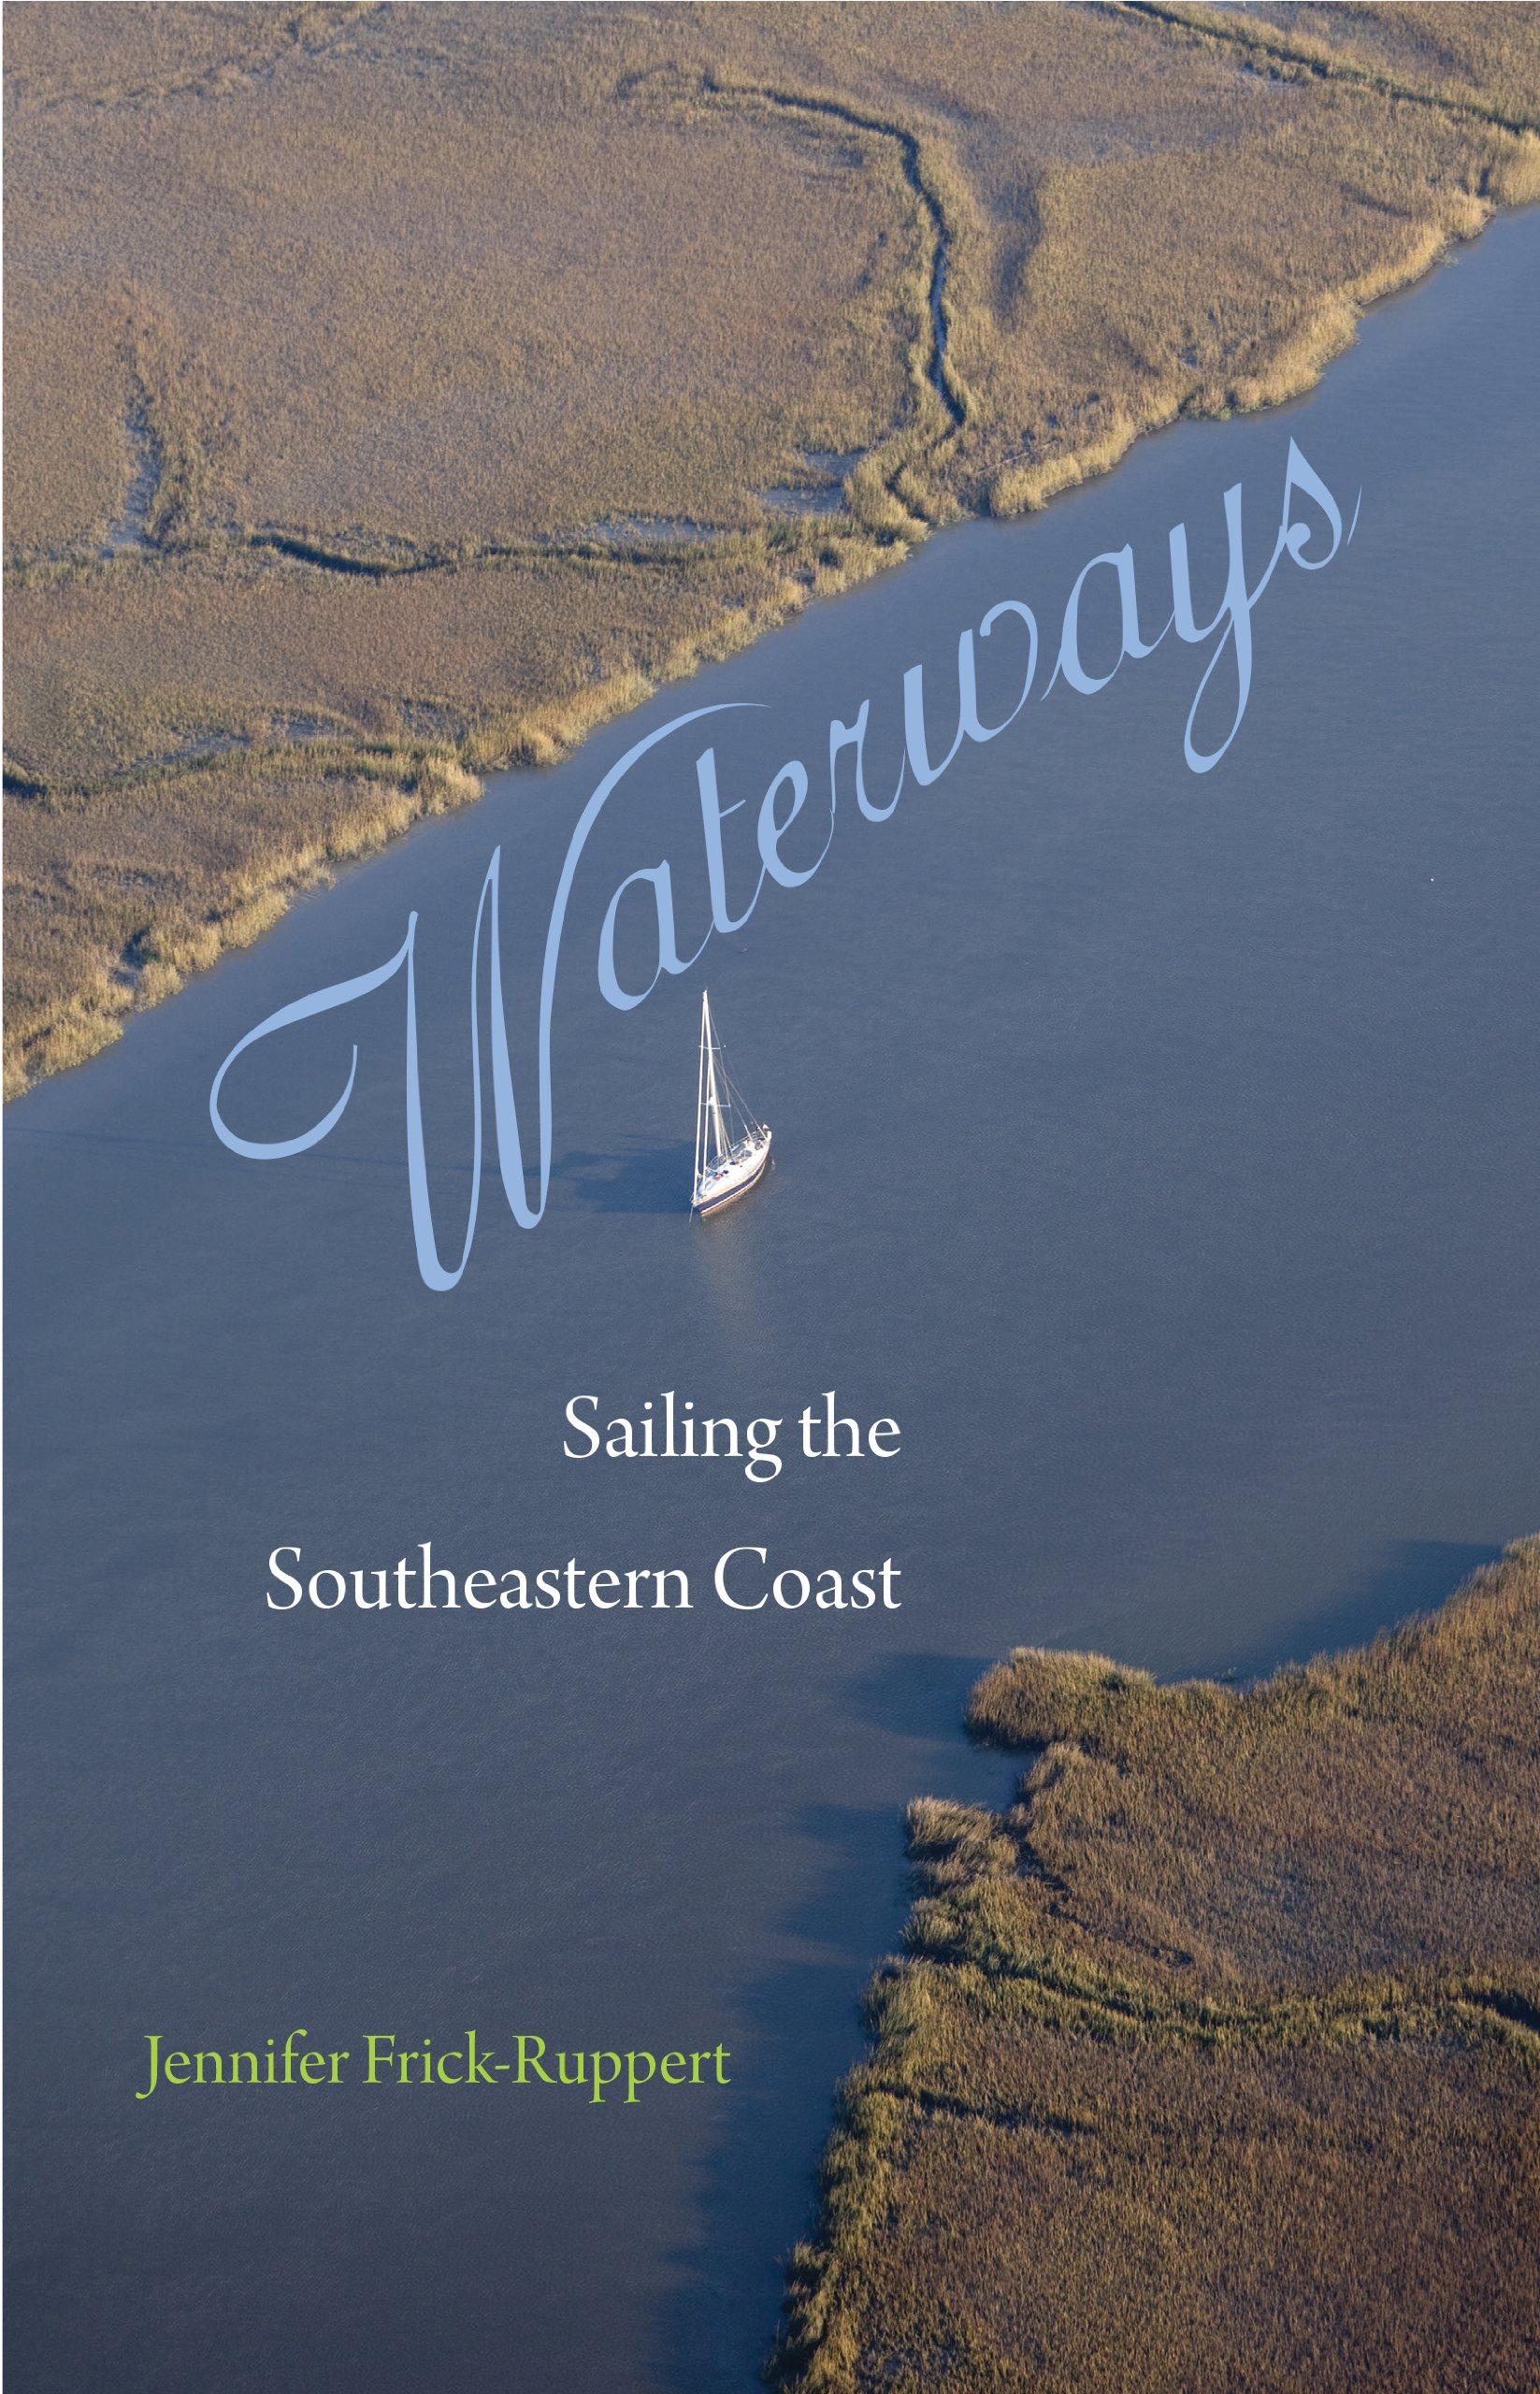 Waterways: Sailing the Southeastern Coast